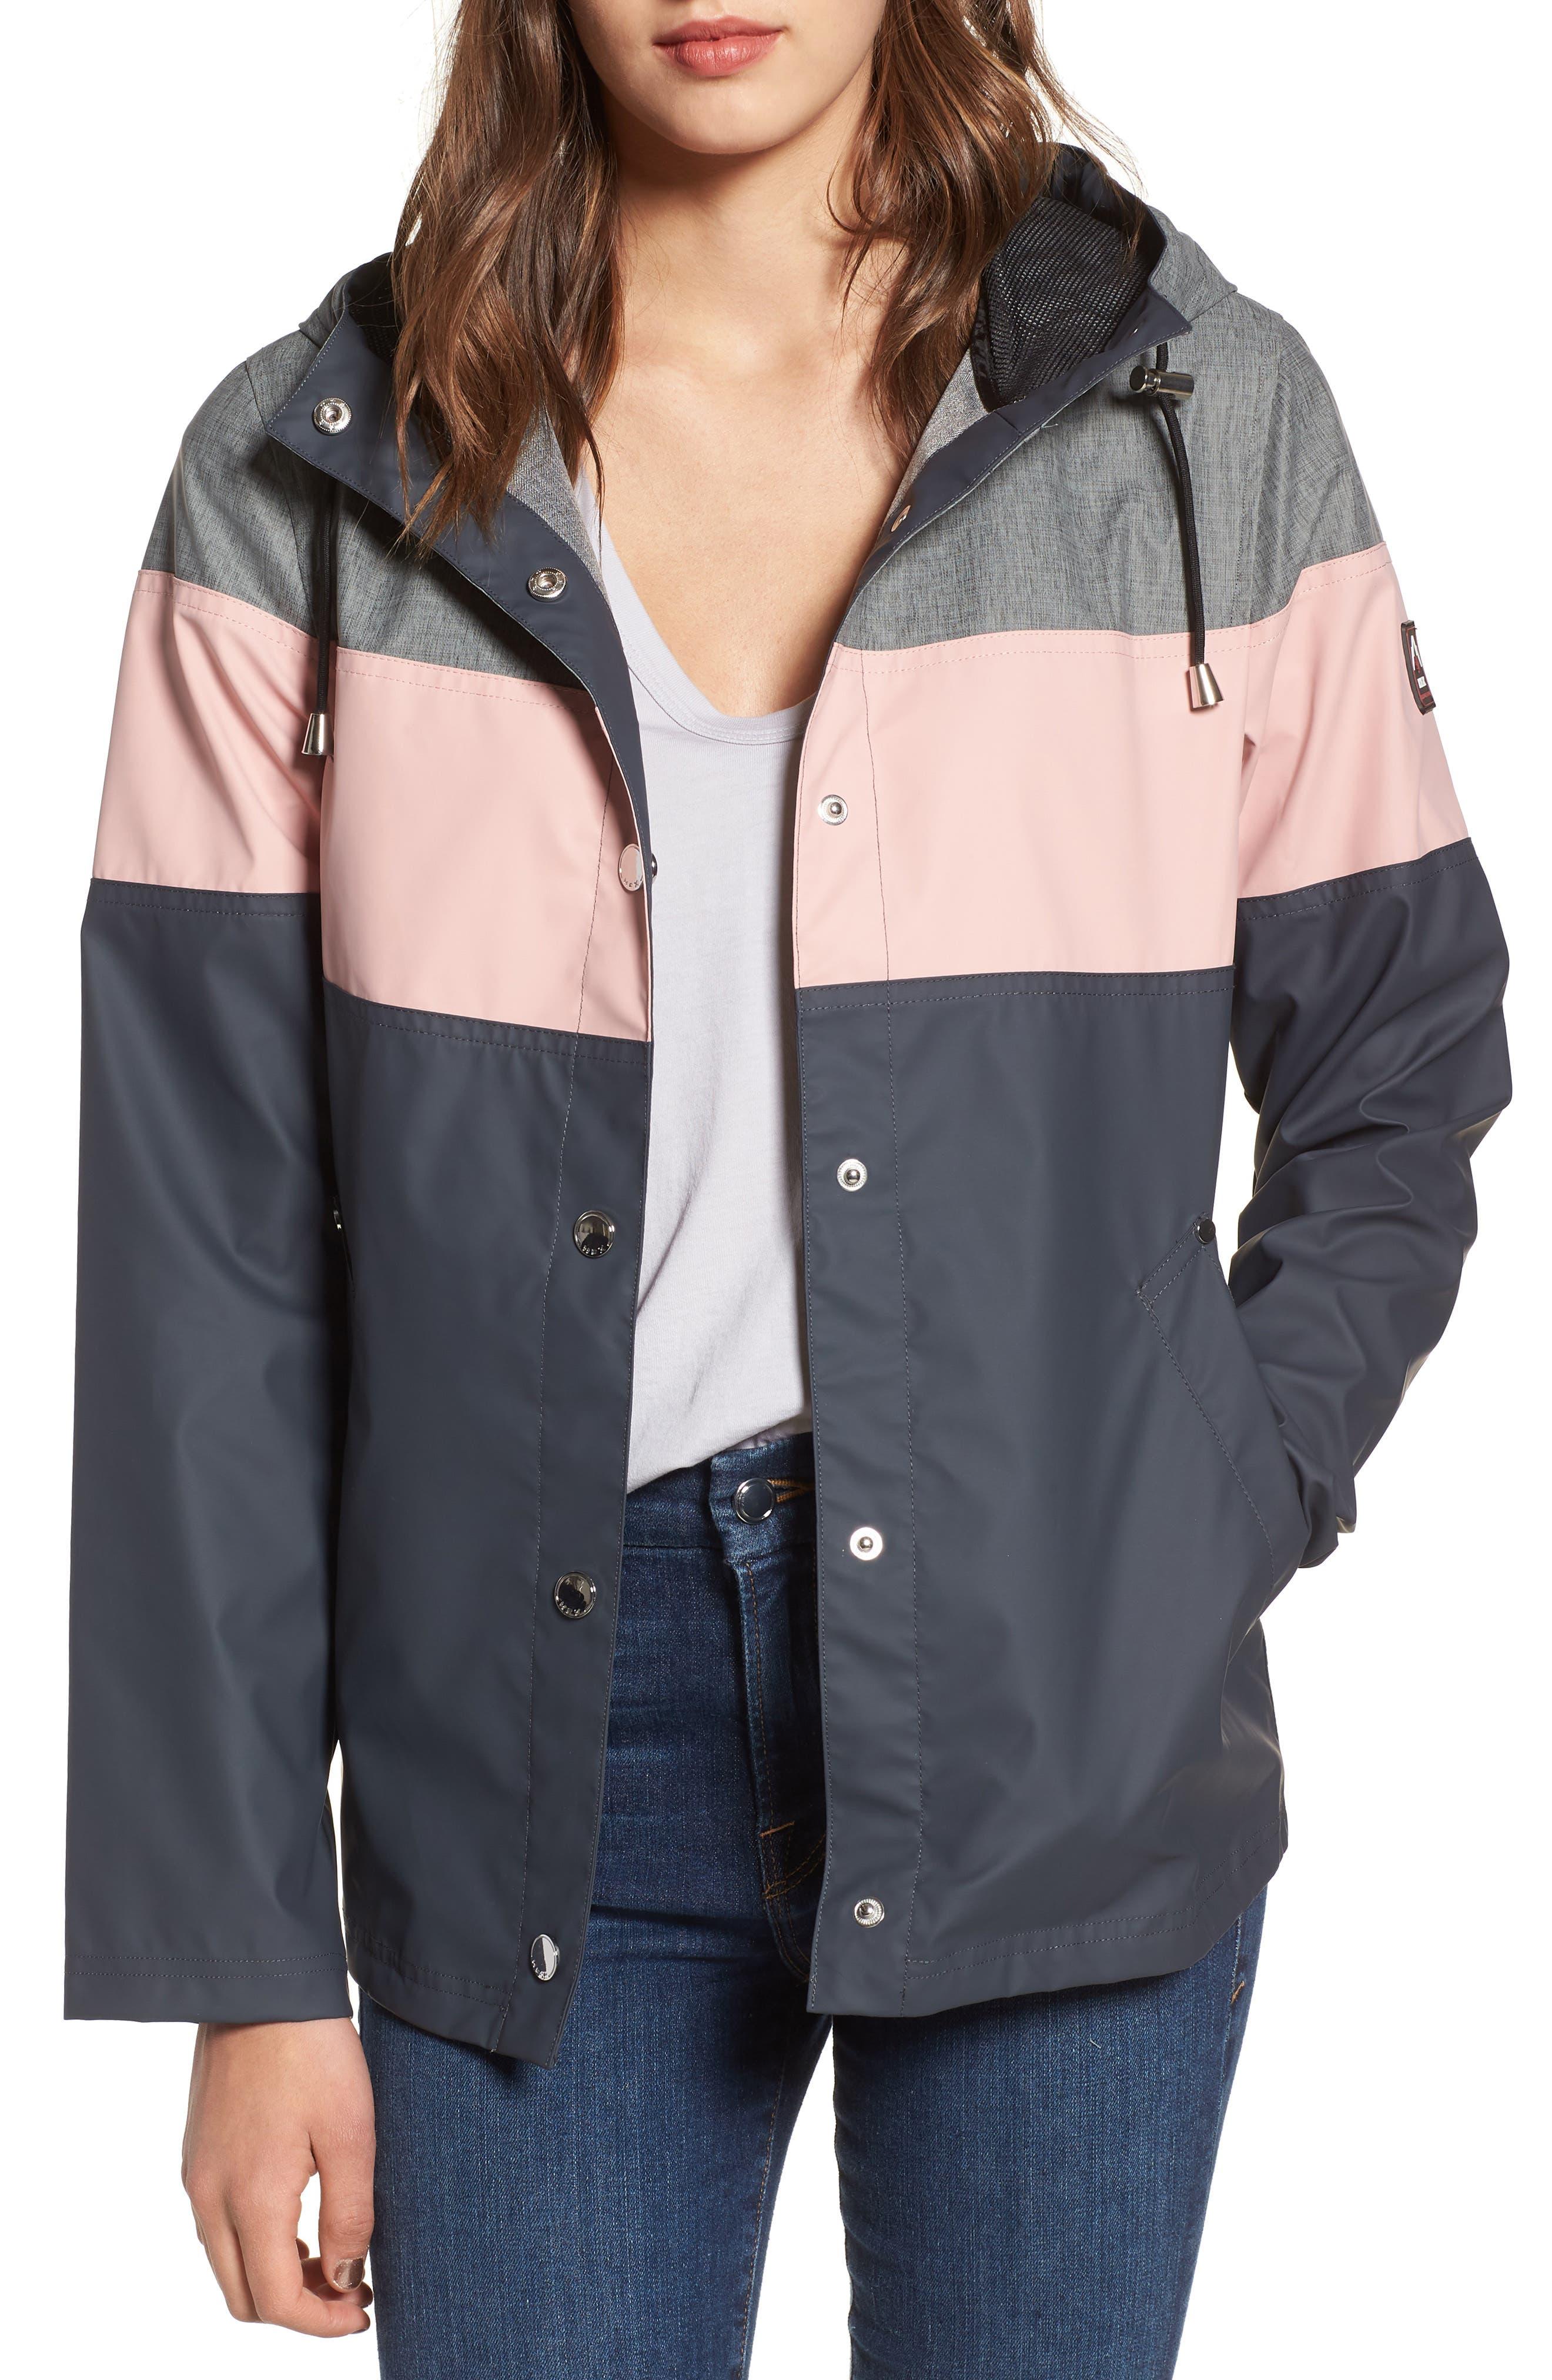 Hooded Raincoat,                         Main,                         color, Storm/ Blush/ Mech Grey